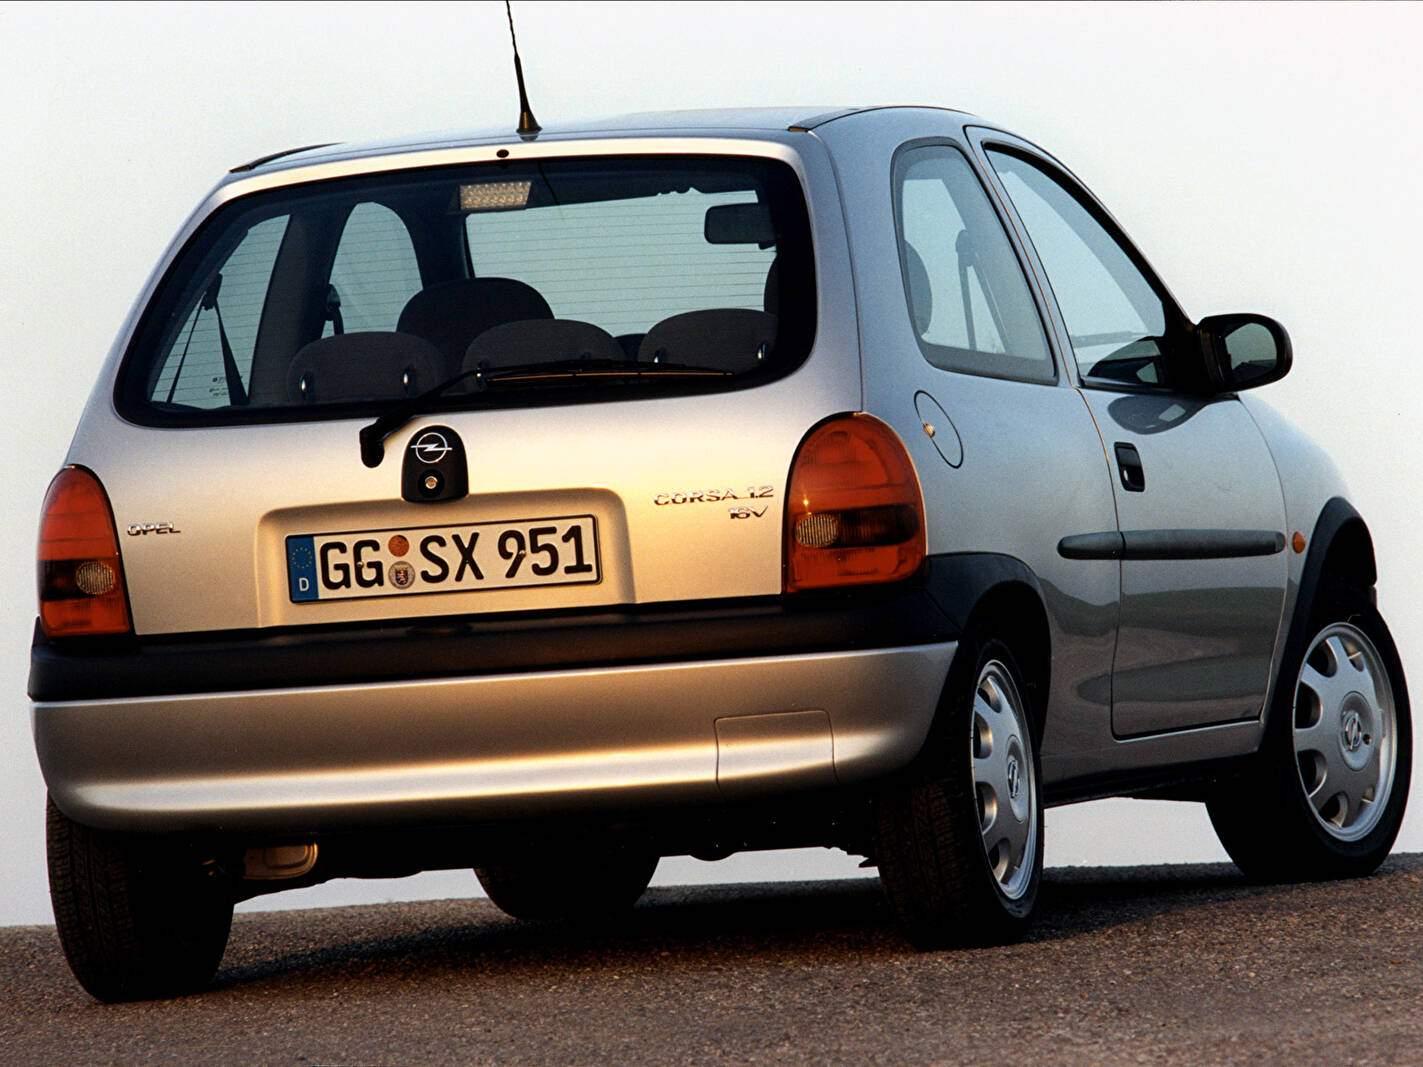 Opel Corsa II 1.2 16v (1998-2001),  ajouté par fox58